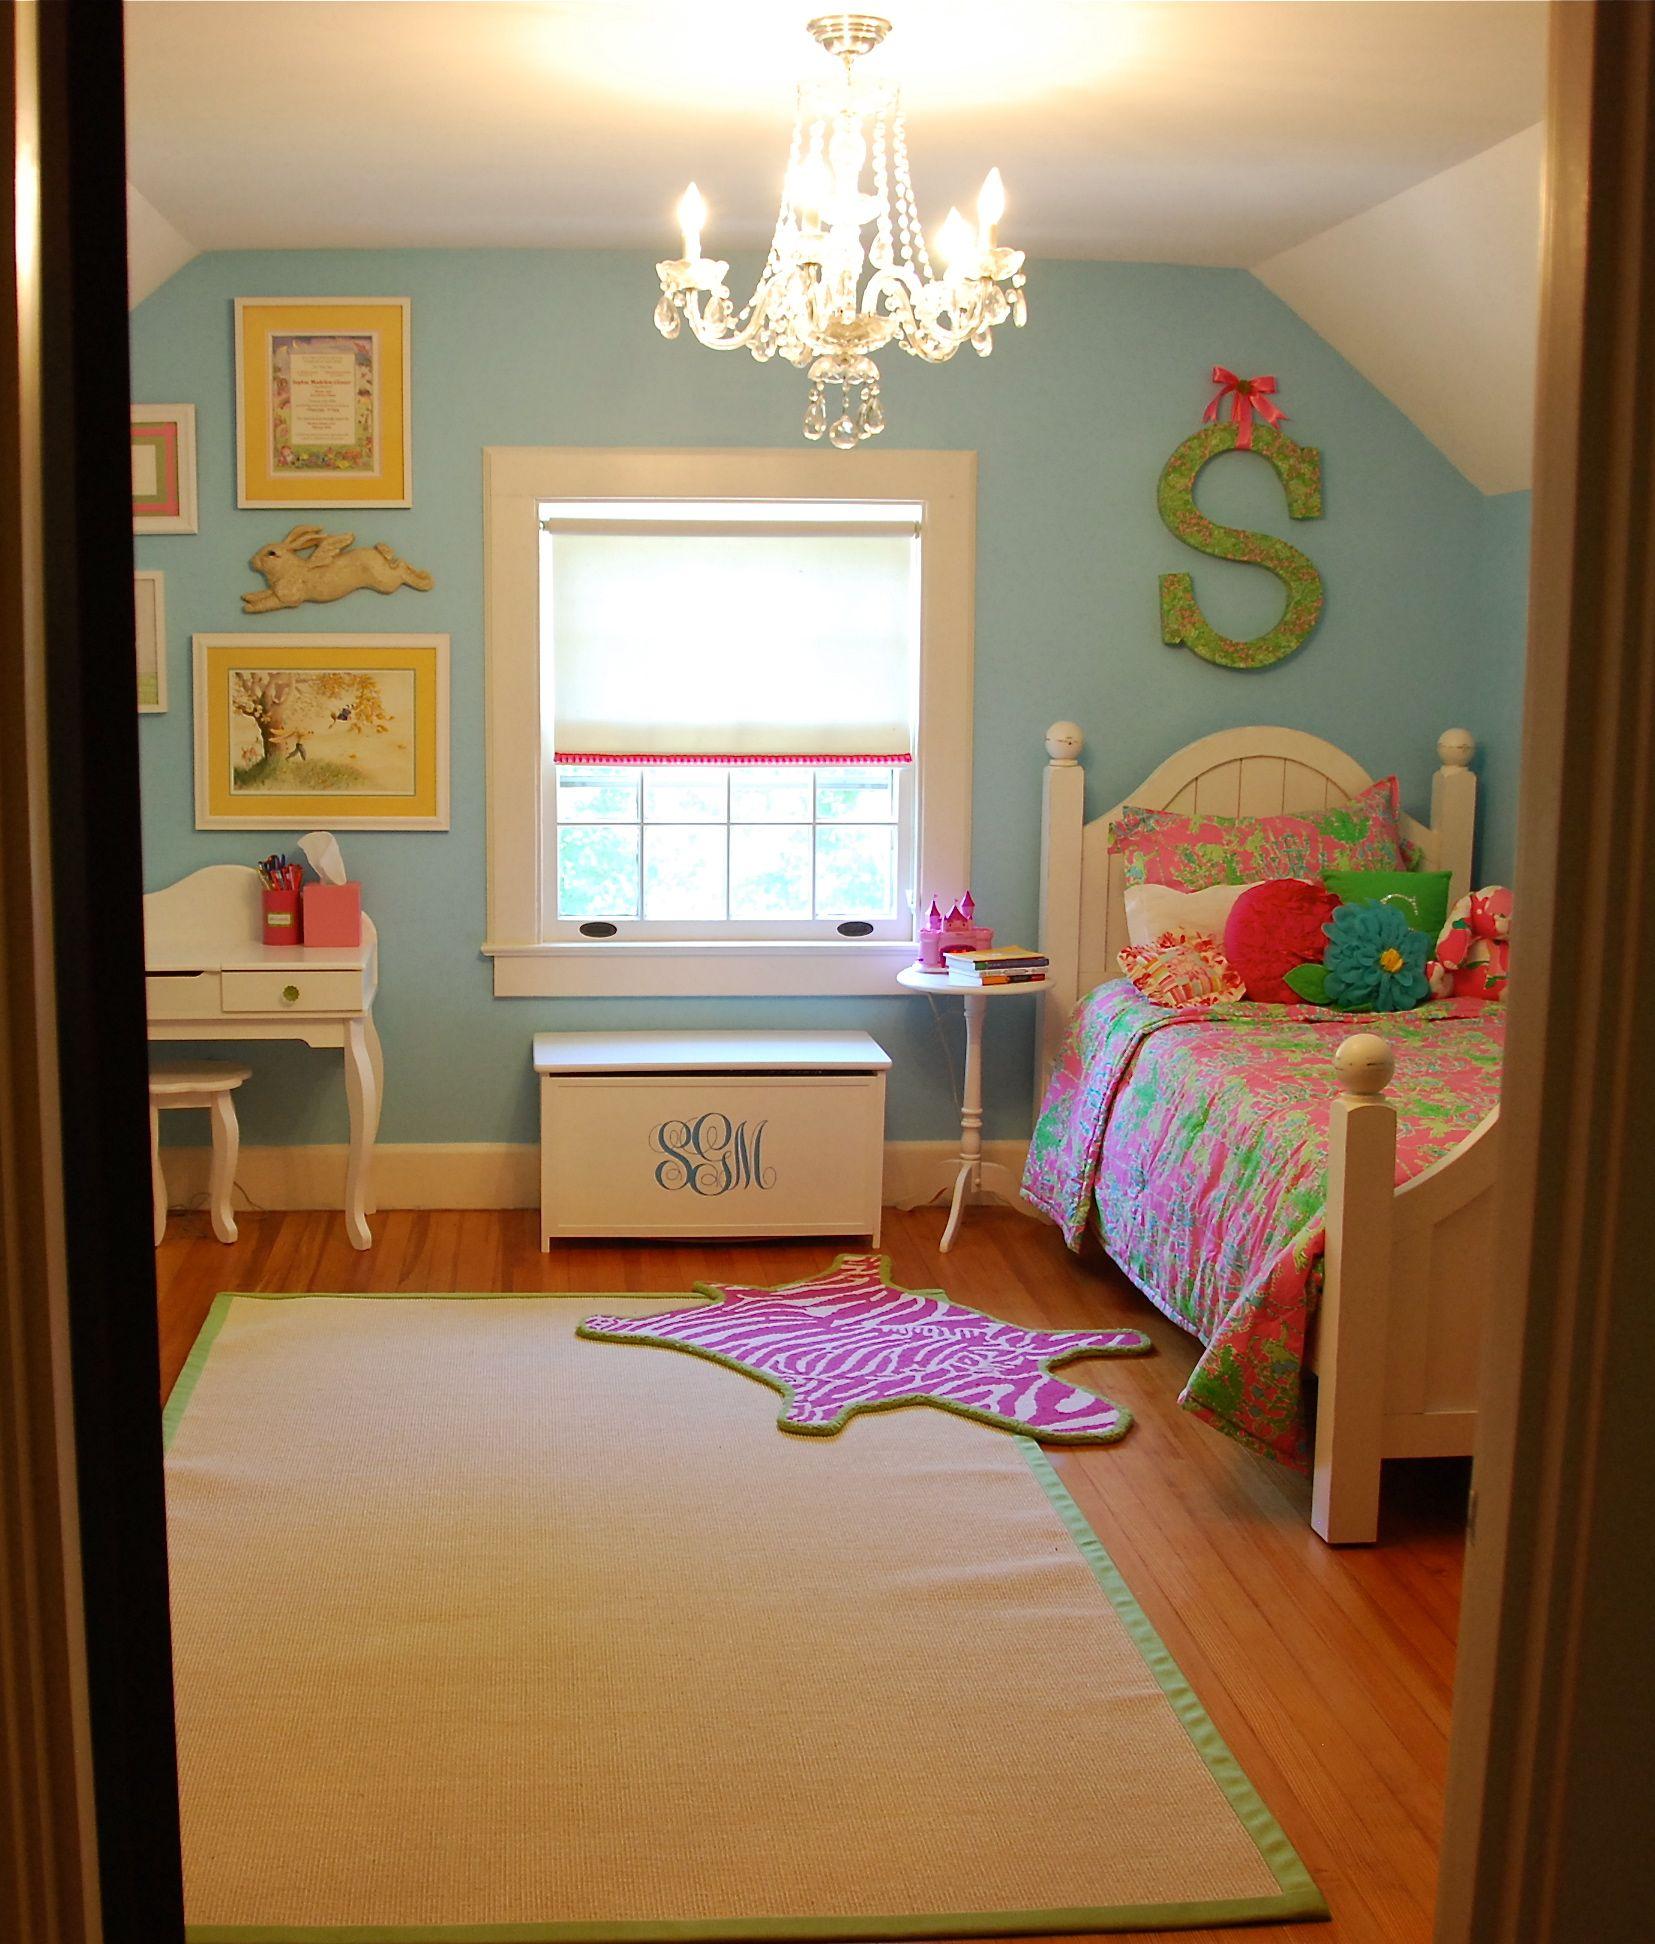 The Great Little Cutie Room Reveal Felt So Cute